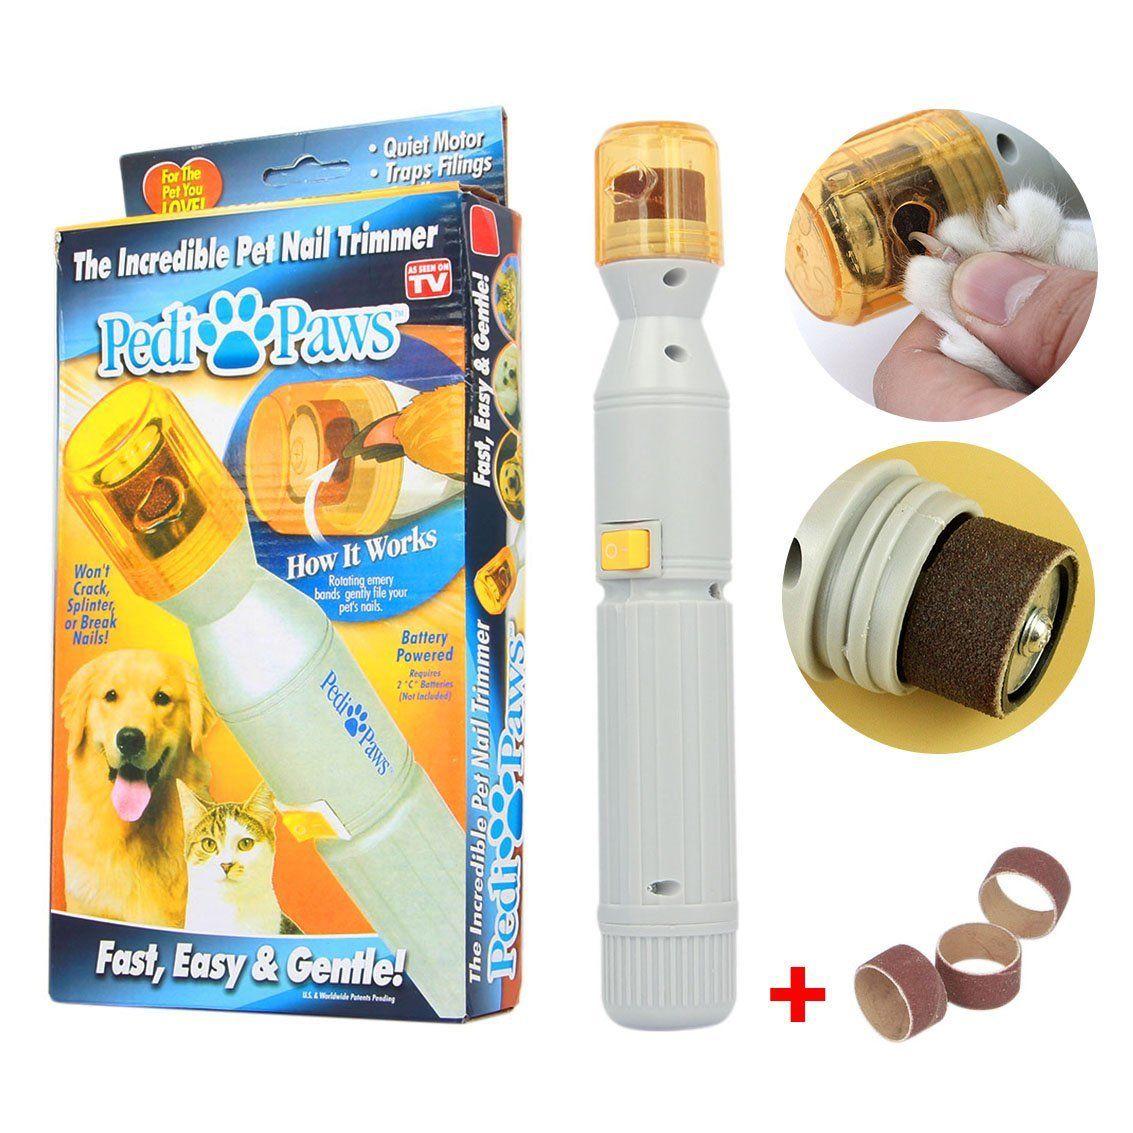 Incredible pet nail trimmer machine PEDI PAWS electric clipper